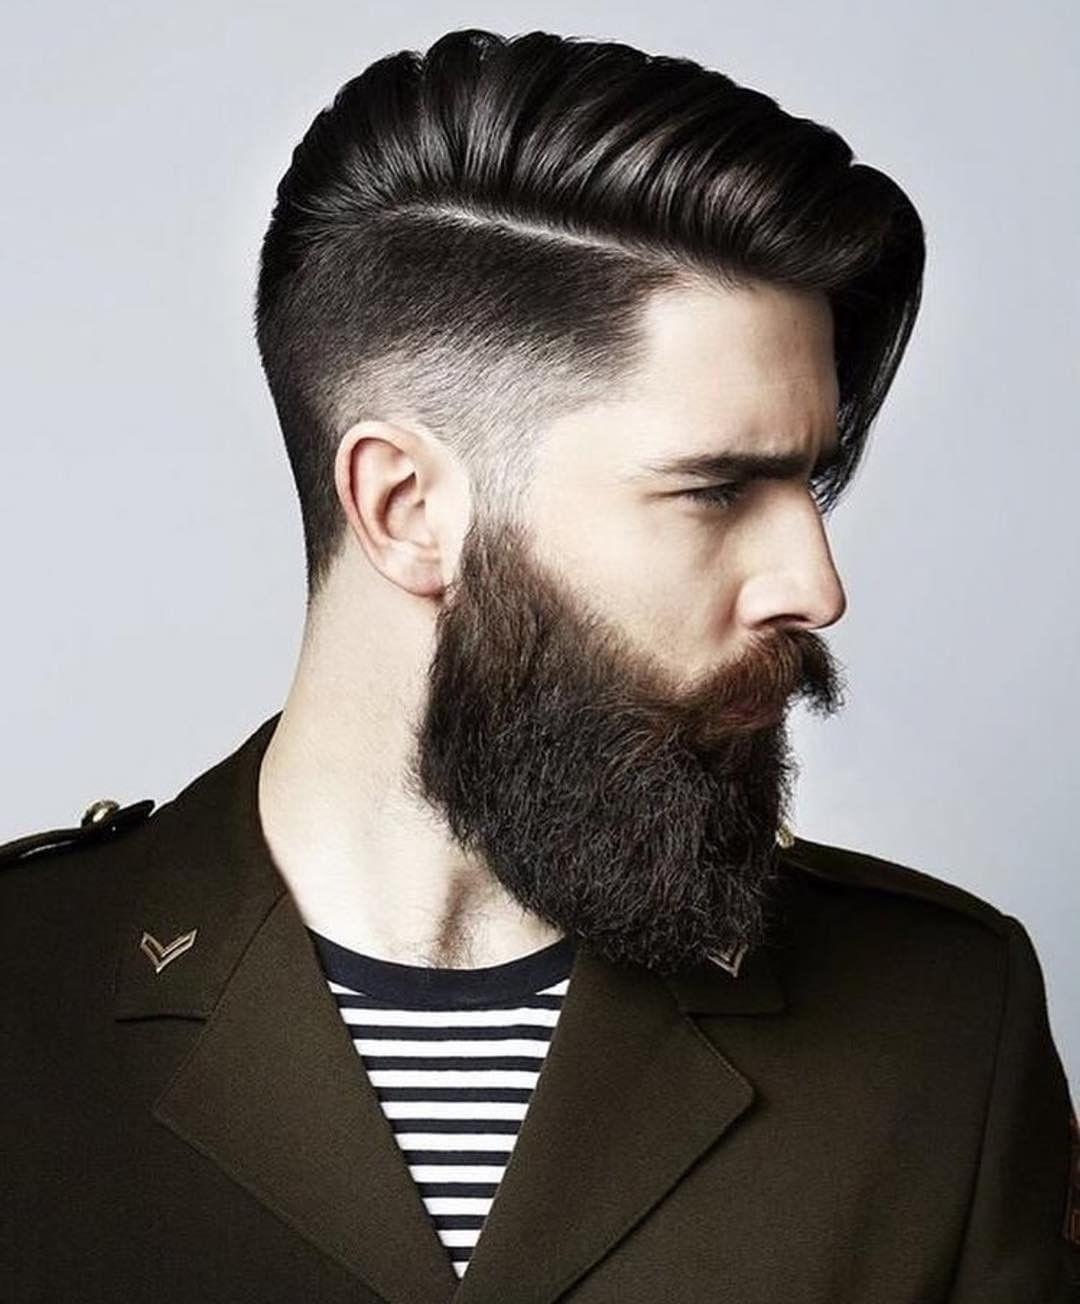 Undercut hairstyles for men men s hairstyles and haircuts for 2017 - 52 New Hairstyles For Men 2017